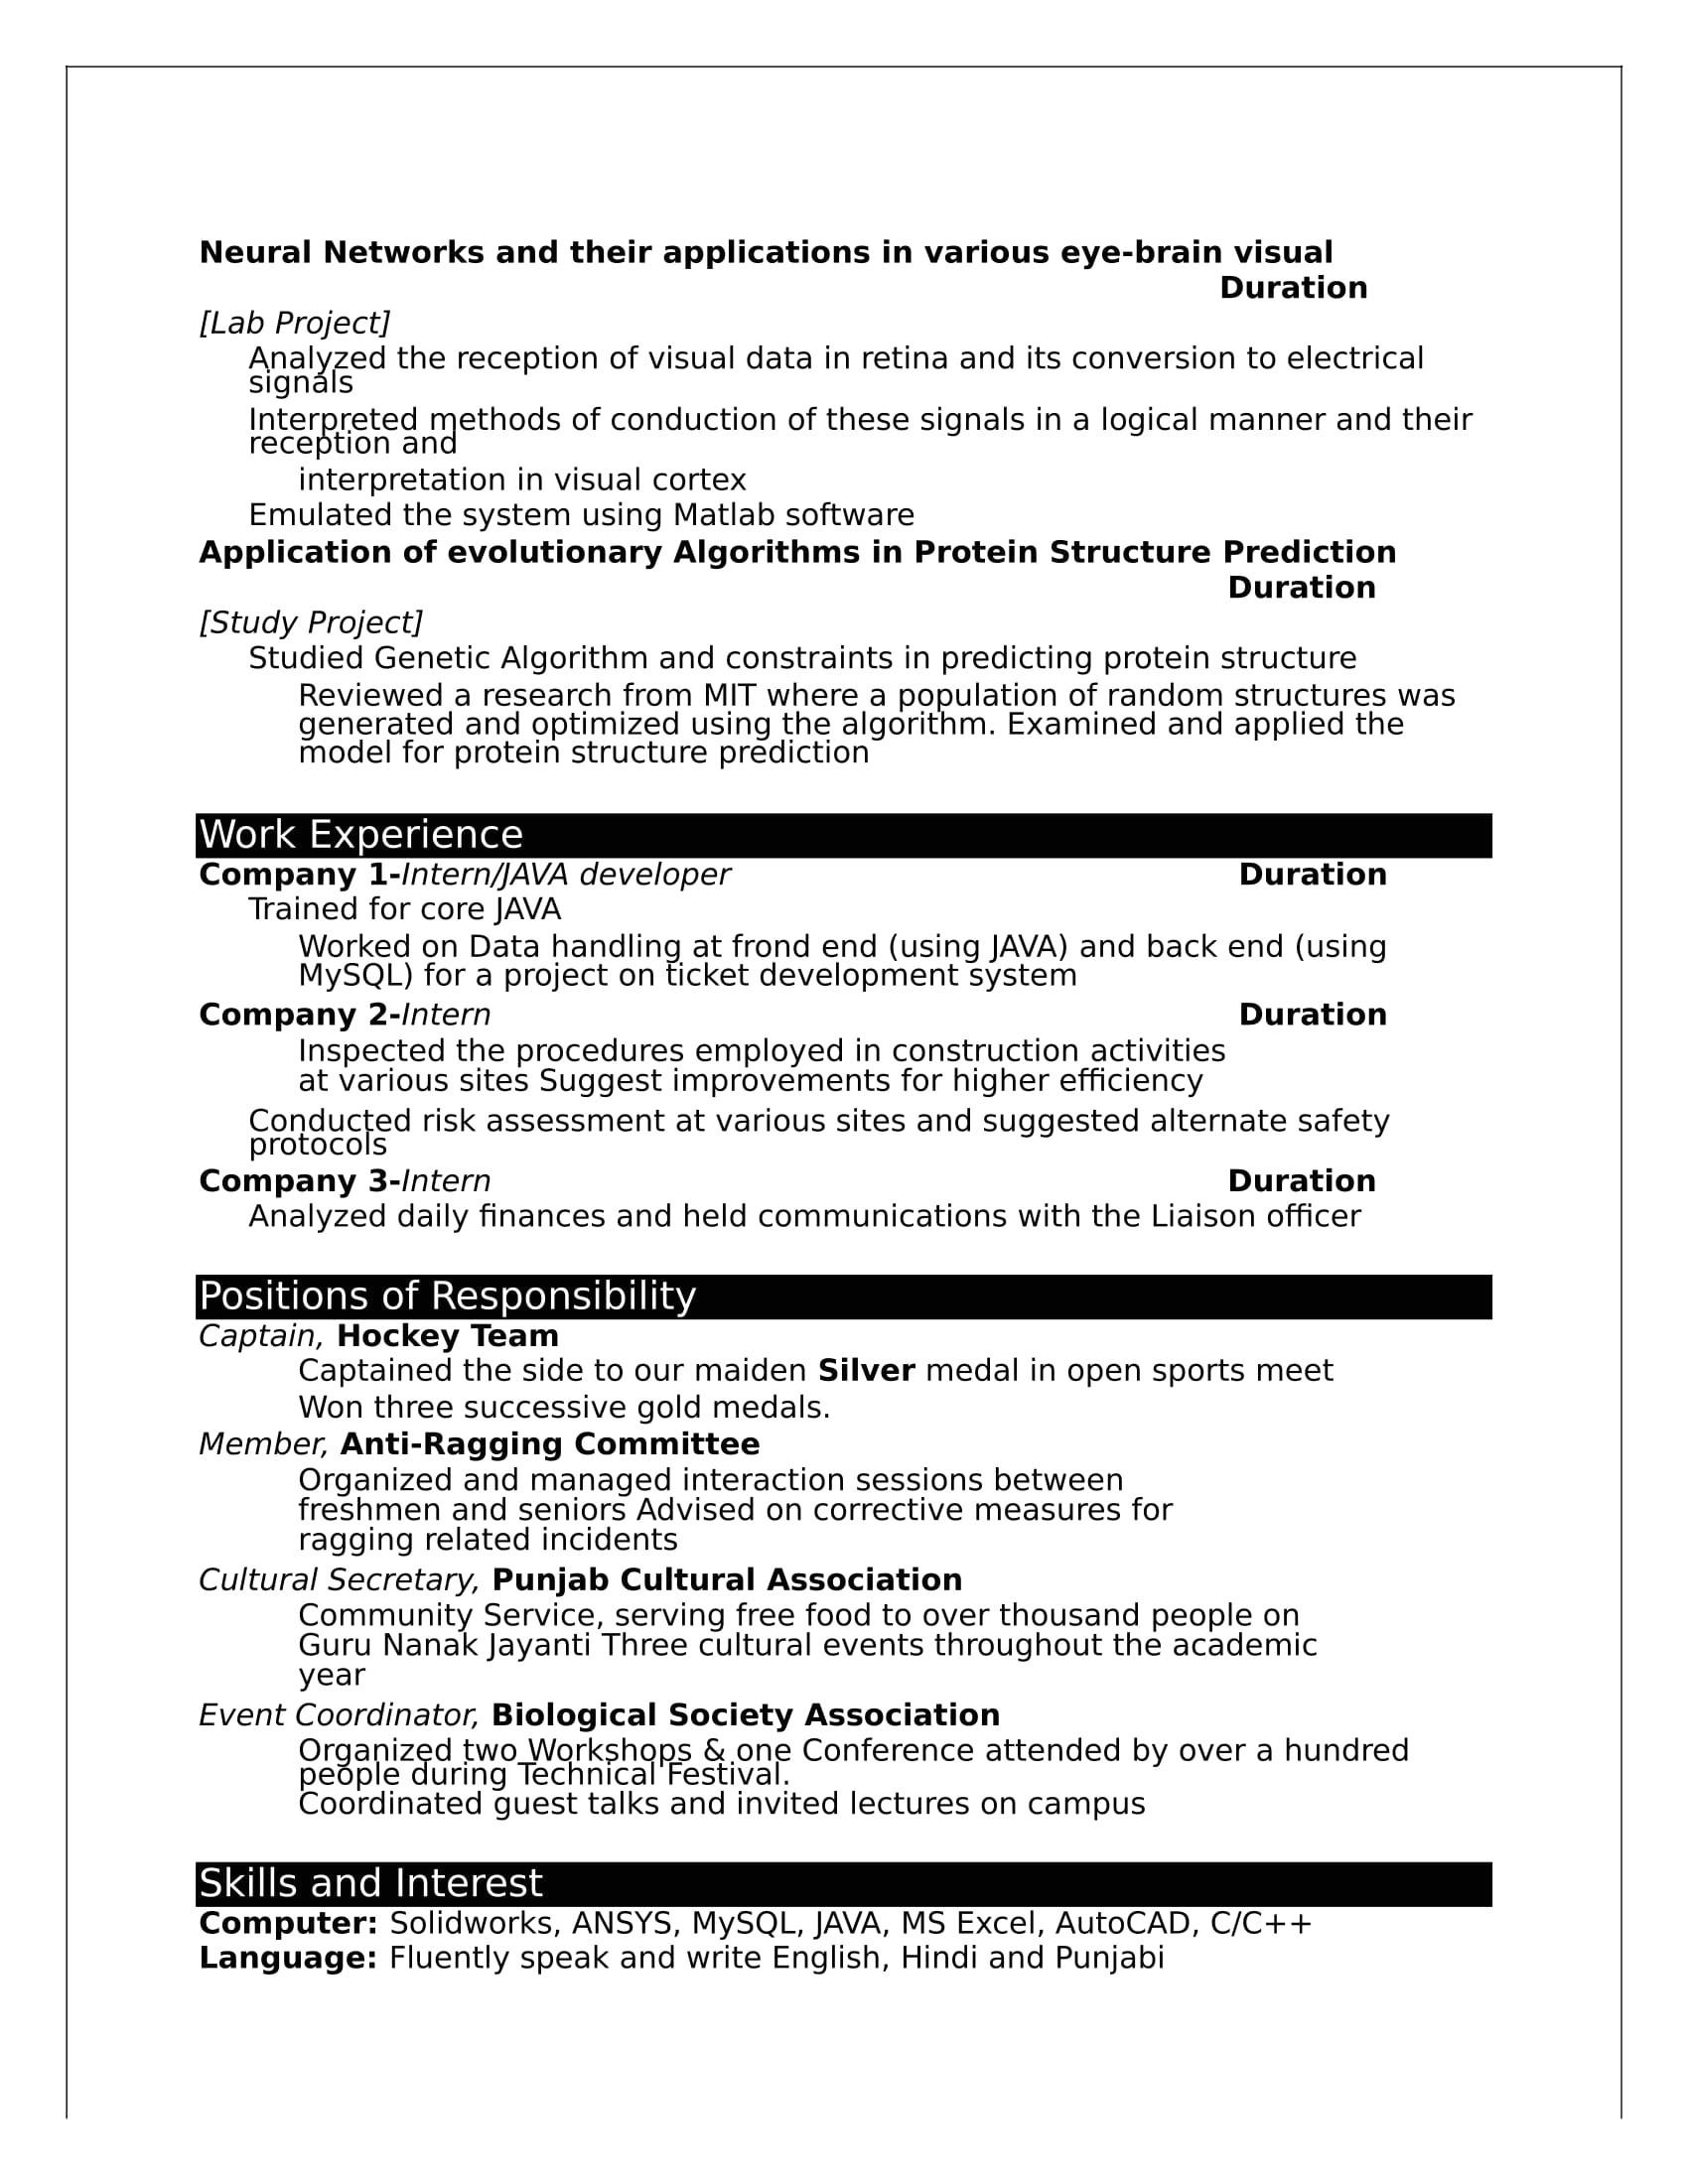 b tech fresher resume format doc download